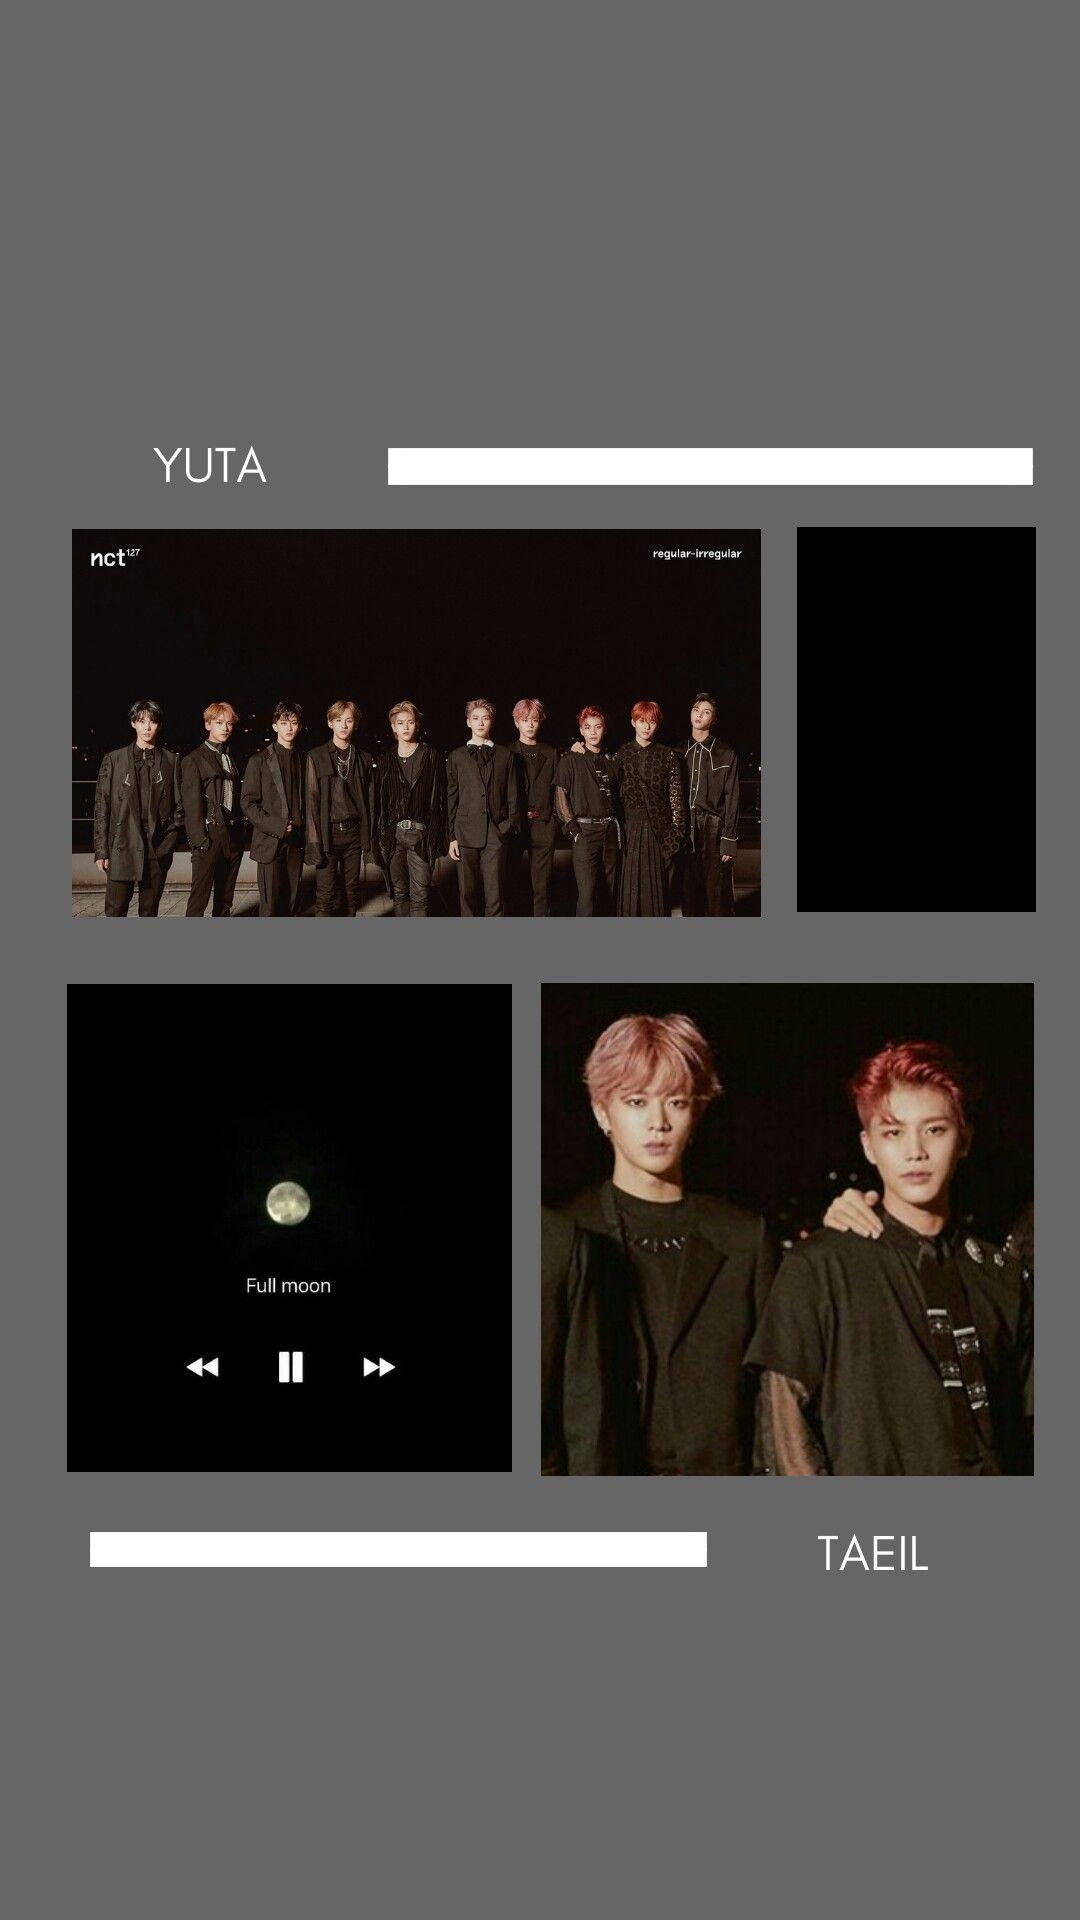 NCT 127 - Yuta Taeil Lockscreen